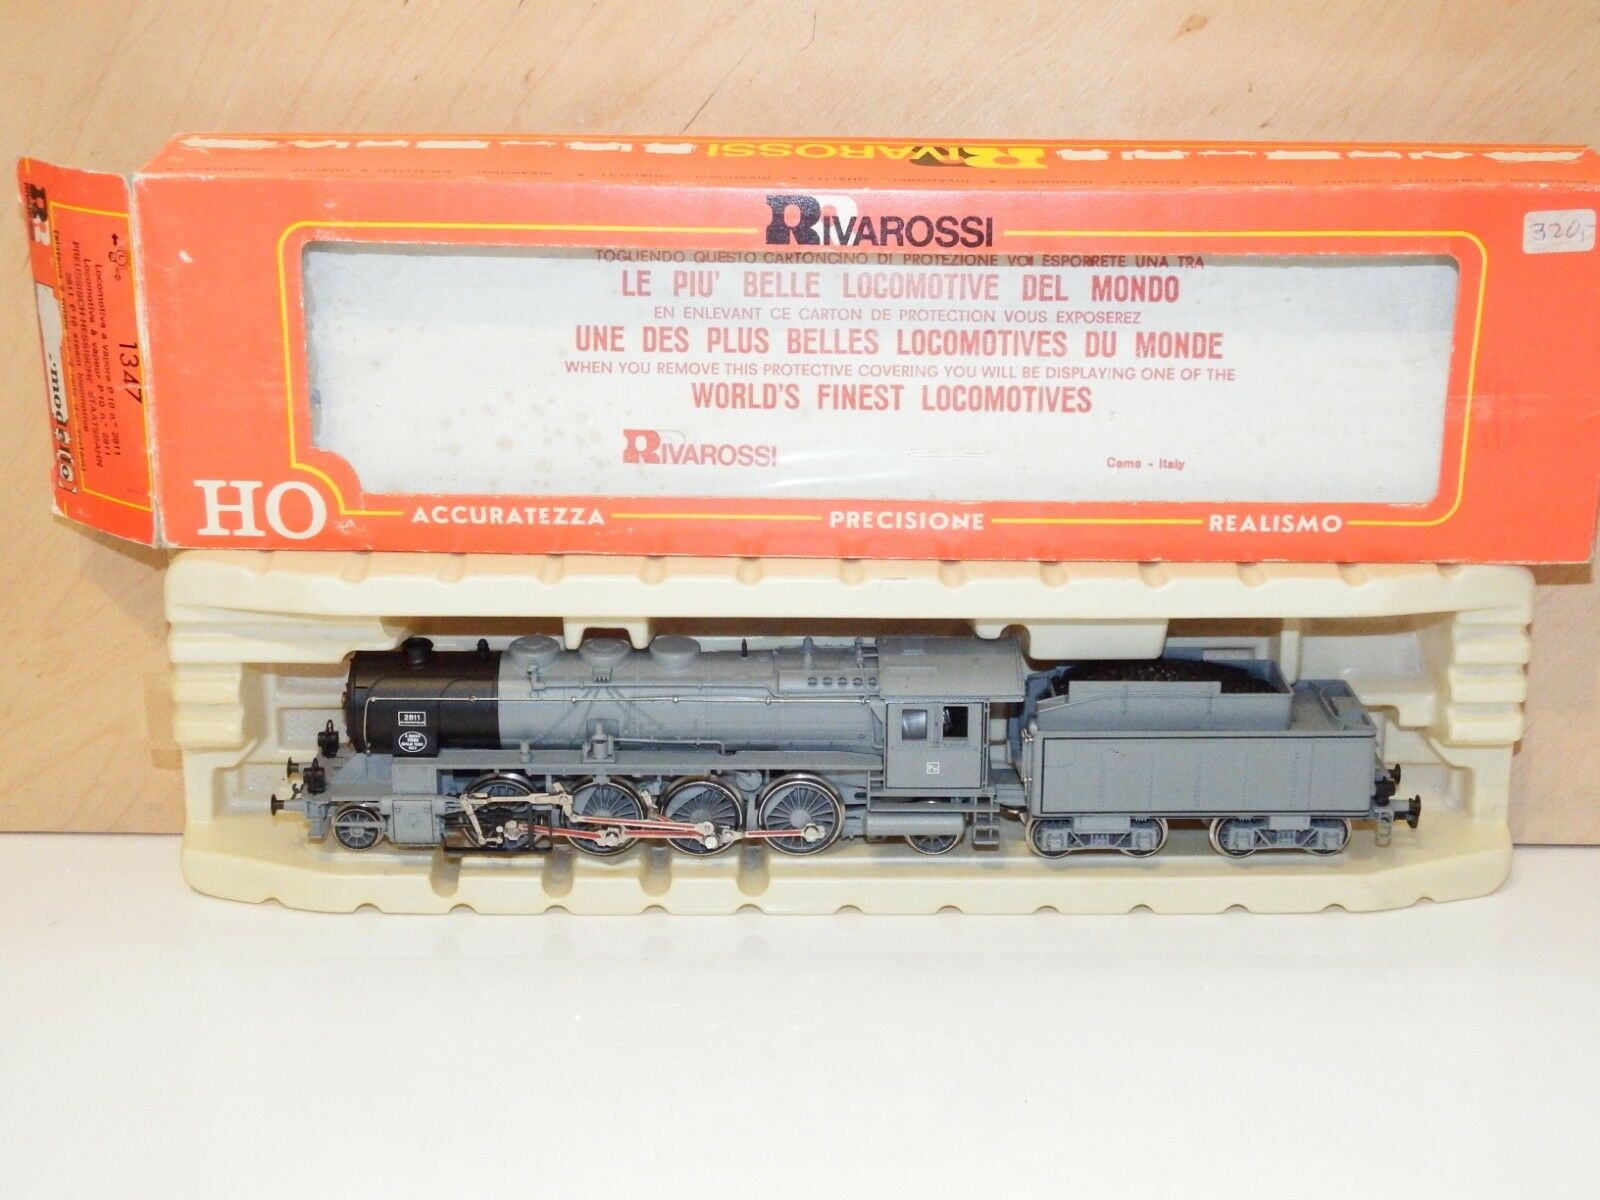 H0 Rivarossi 1347 Dampflok Dampflok Dampflok BR P10 2811  Neuwertig OVP 2901 f0e1f1